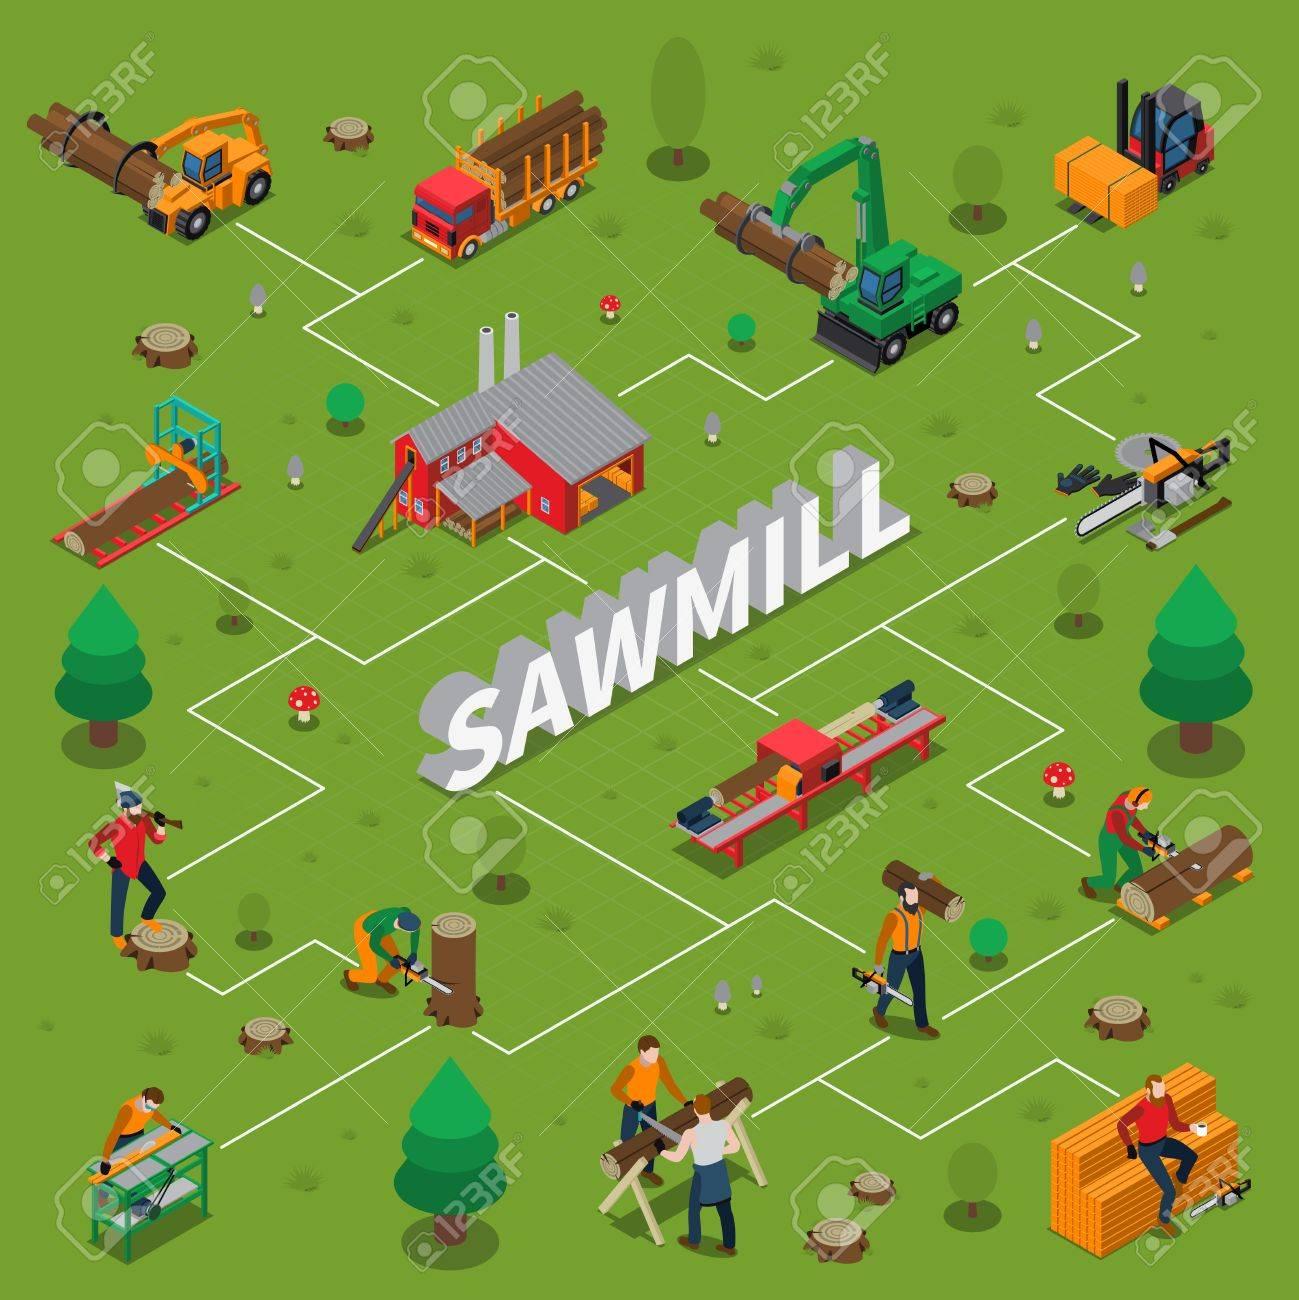 Sawmill timber mill lumberjack isometric flowchart with machines